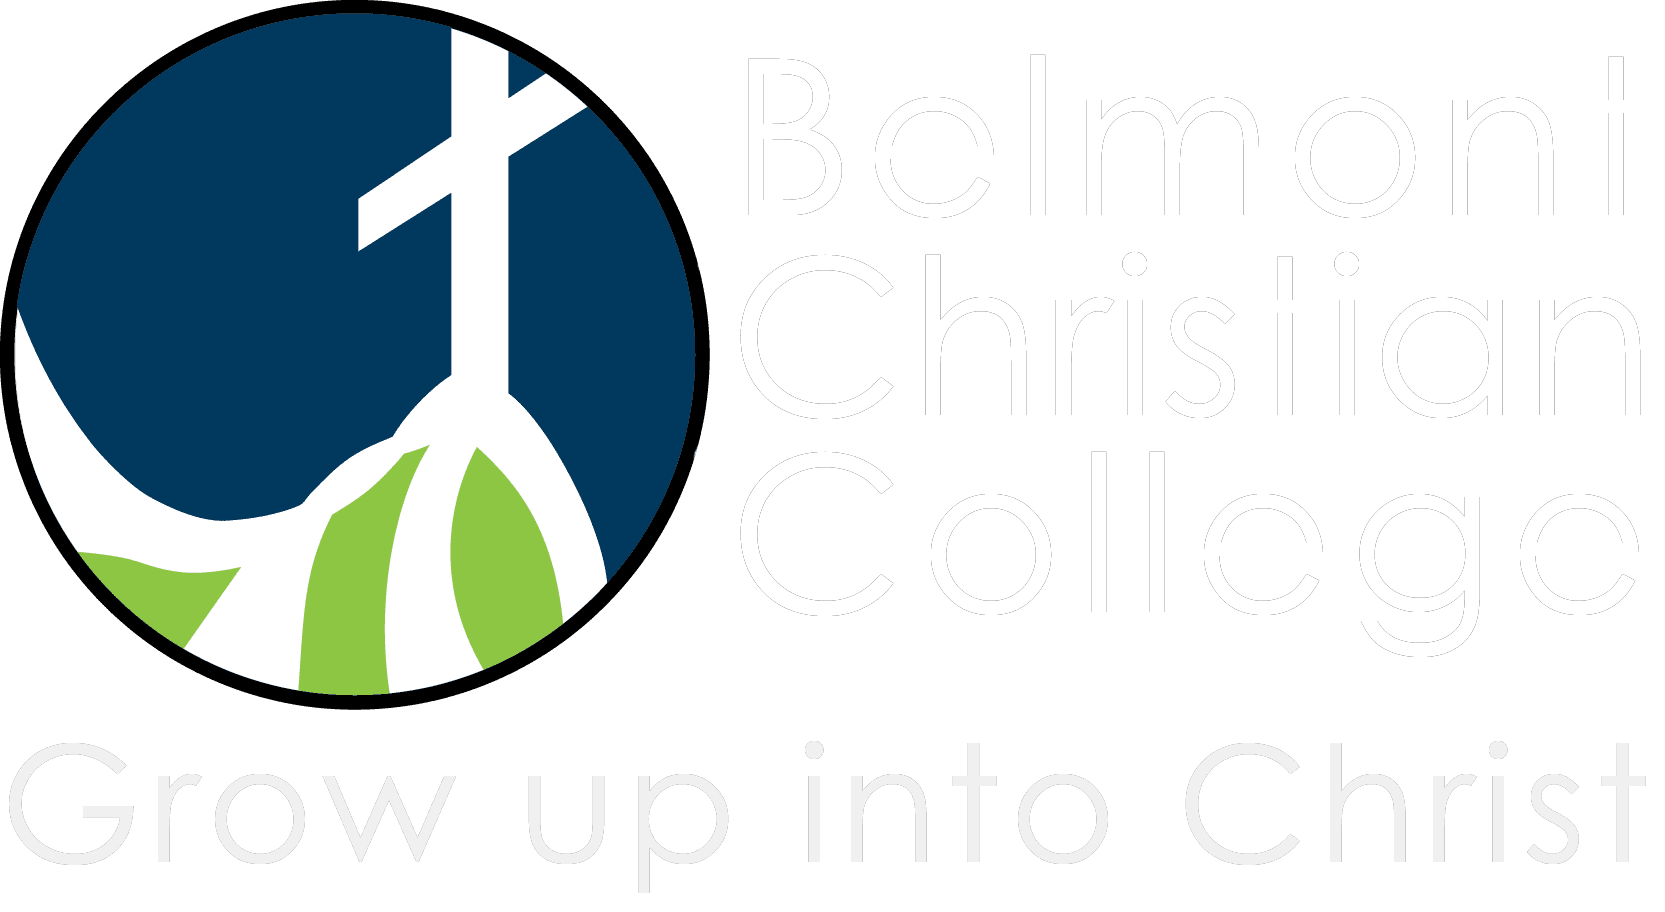 Belmont Christian College